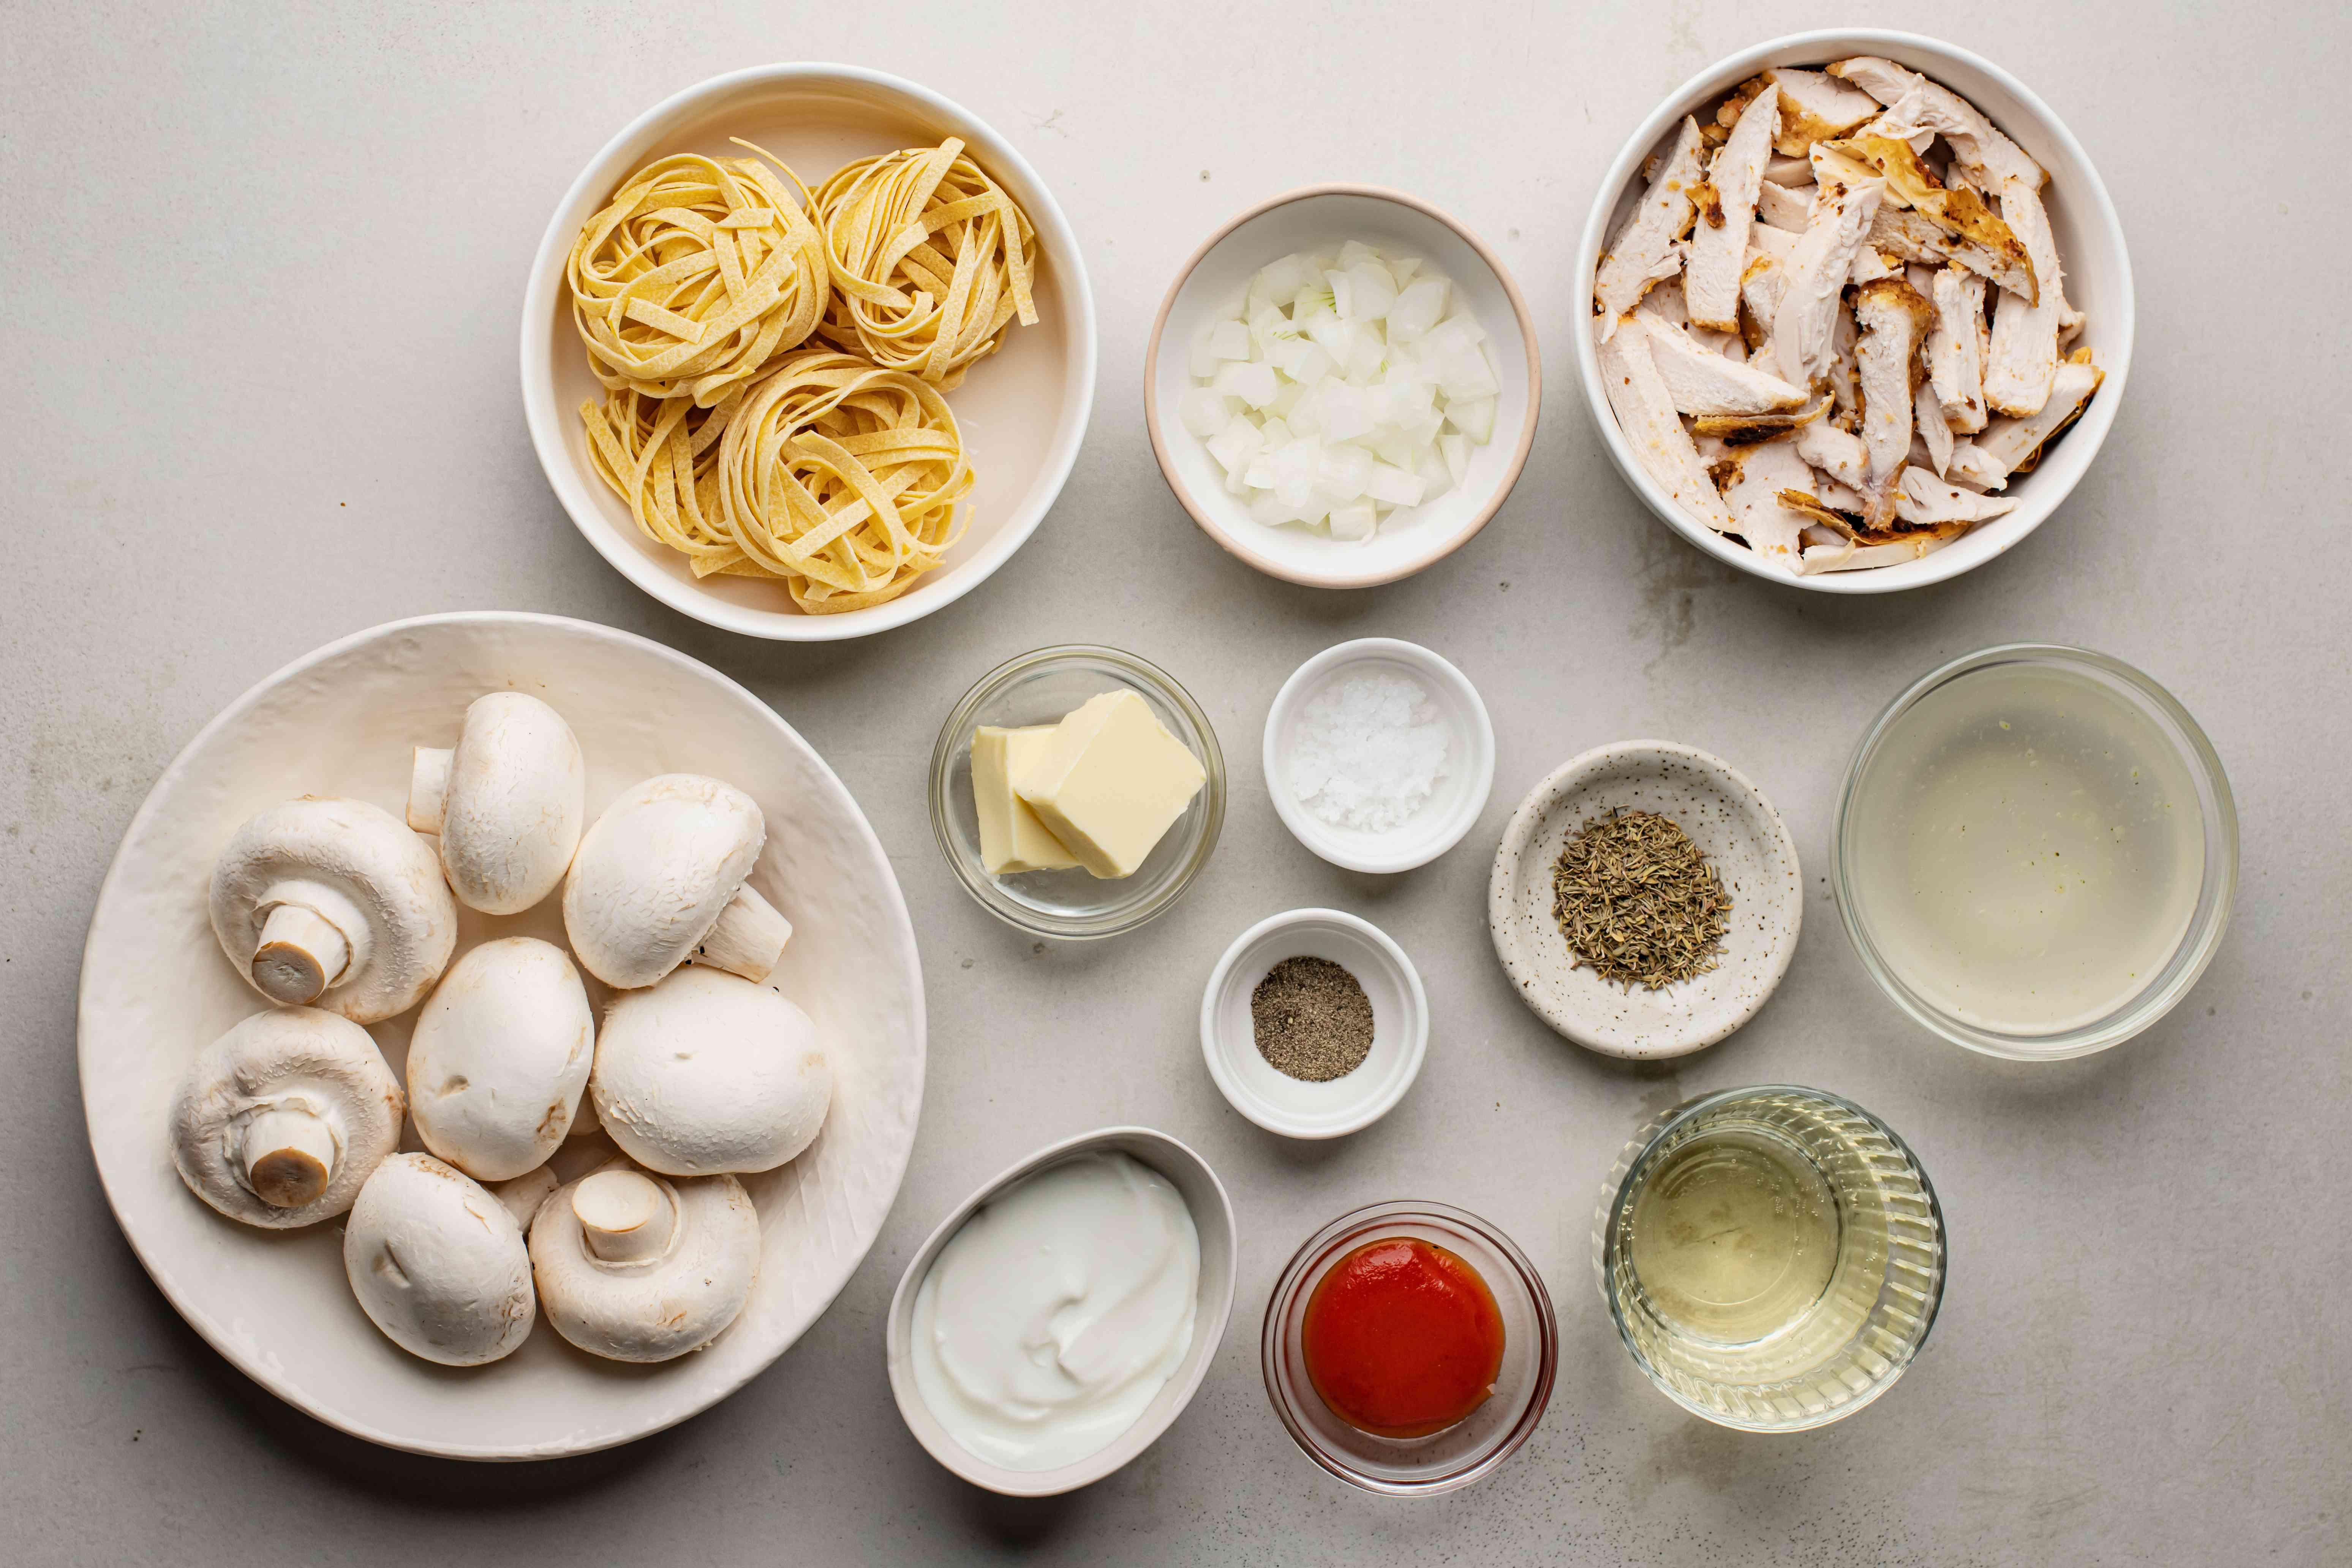 Ingredients for leftovers stroganoff